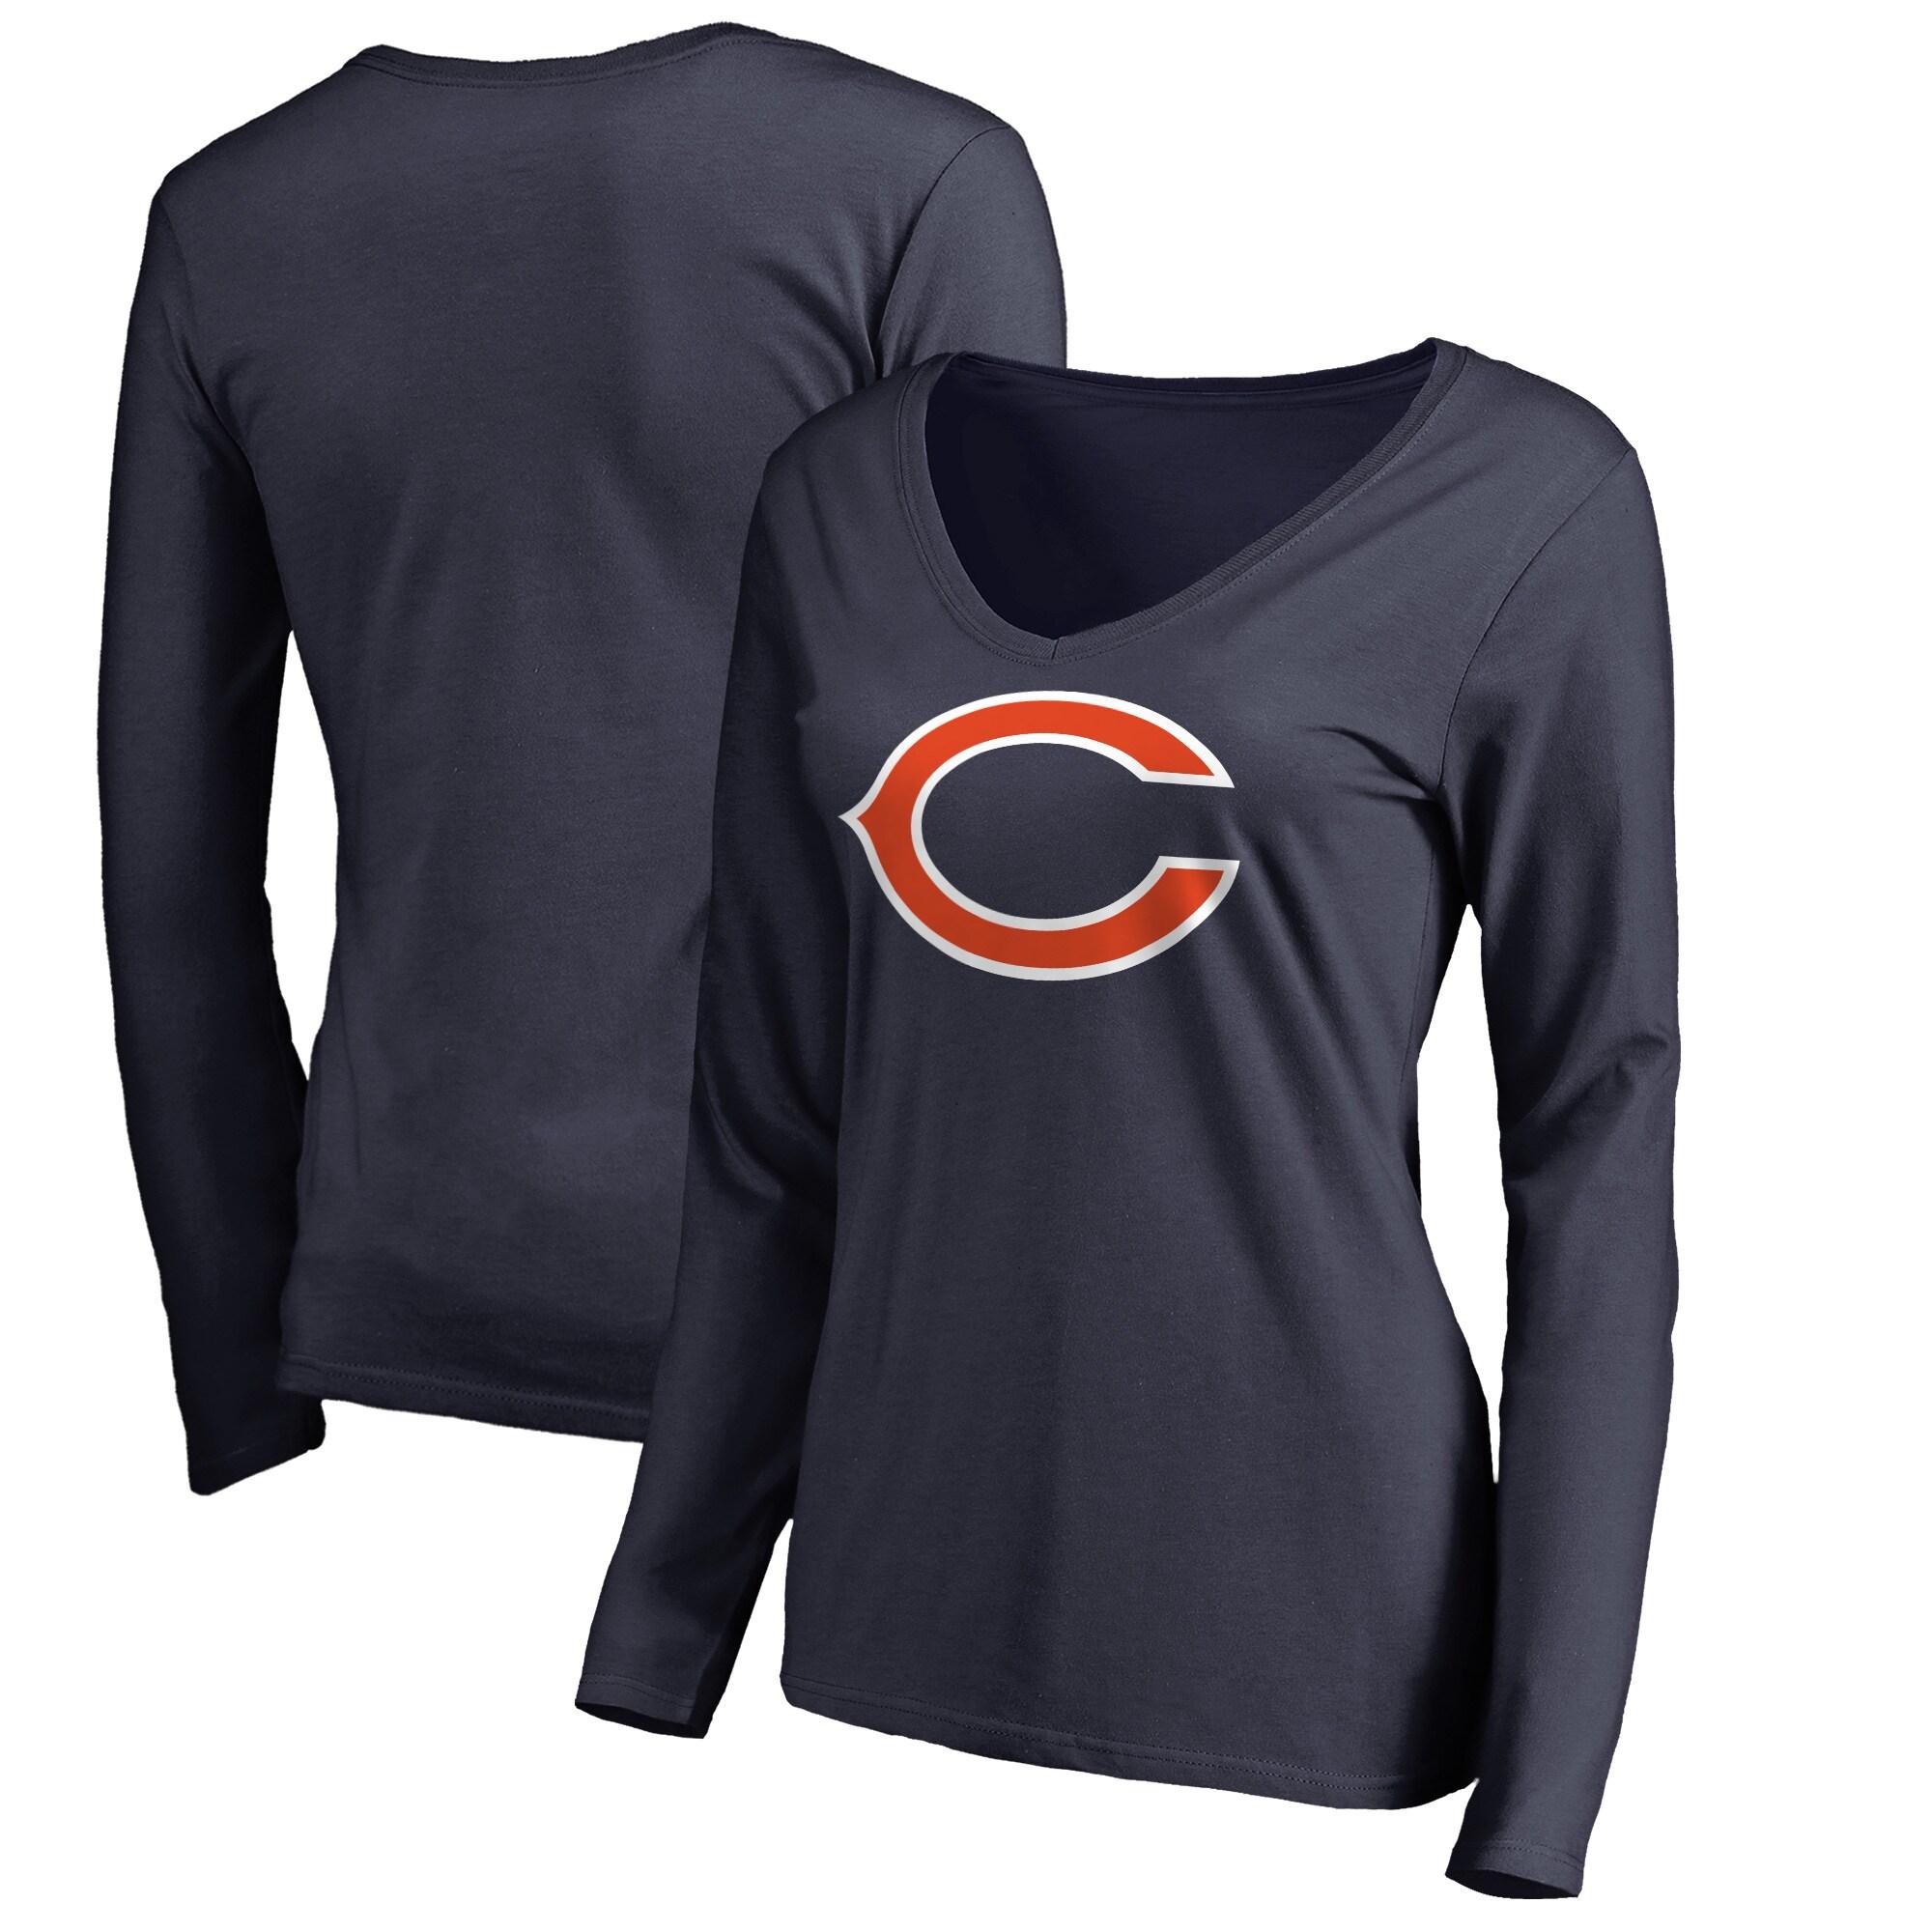 Chicago Bears NFL Pro Line Women's Primary Logo Long Sleeve T-Shirt - Navy